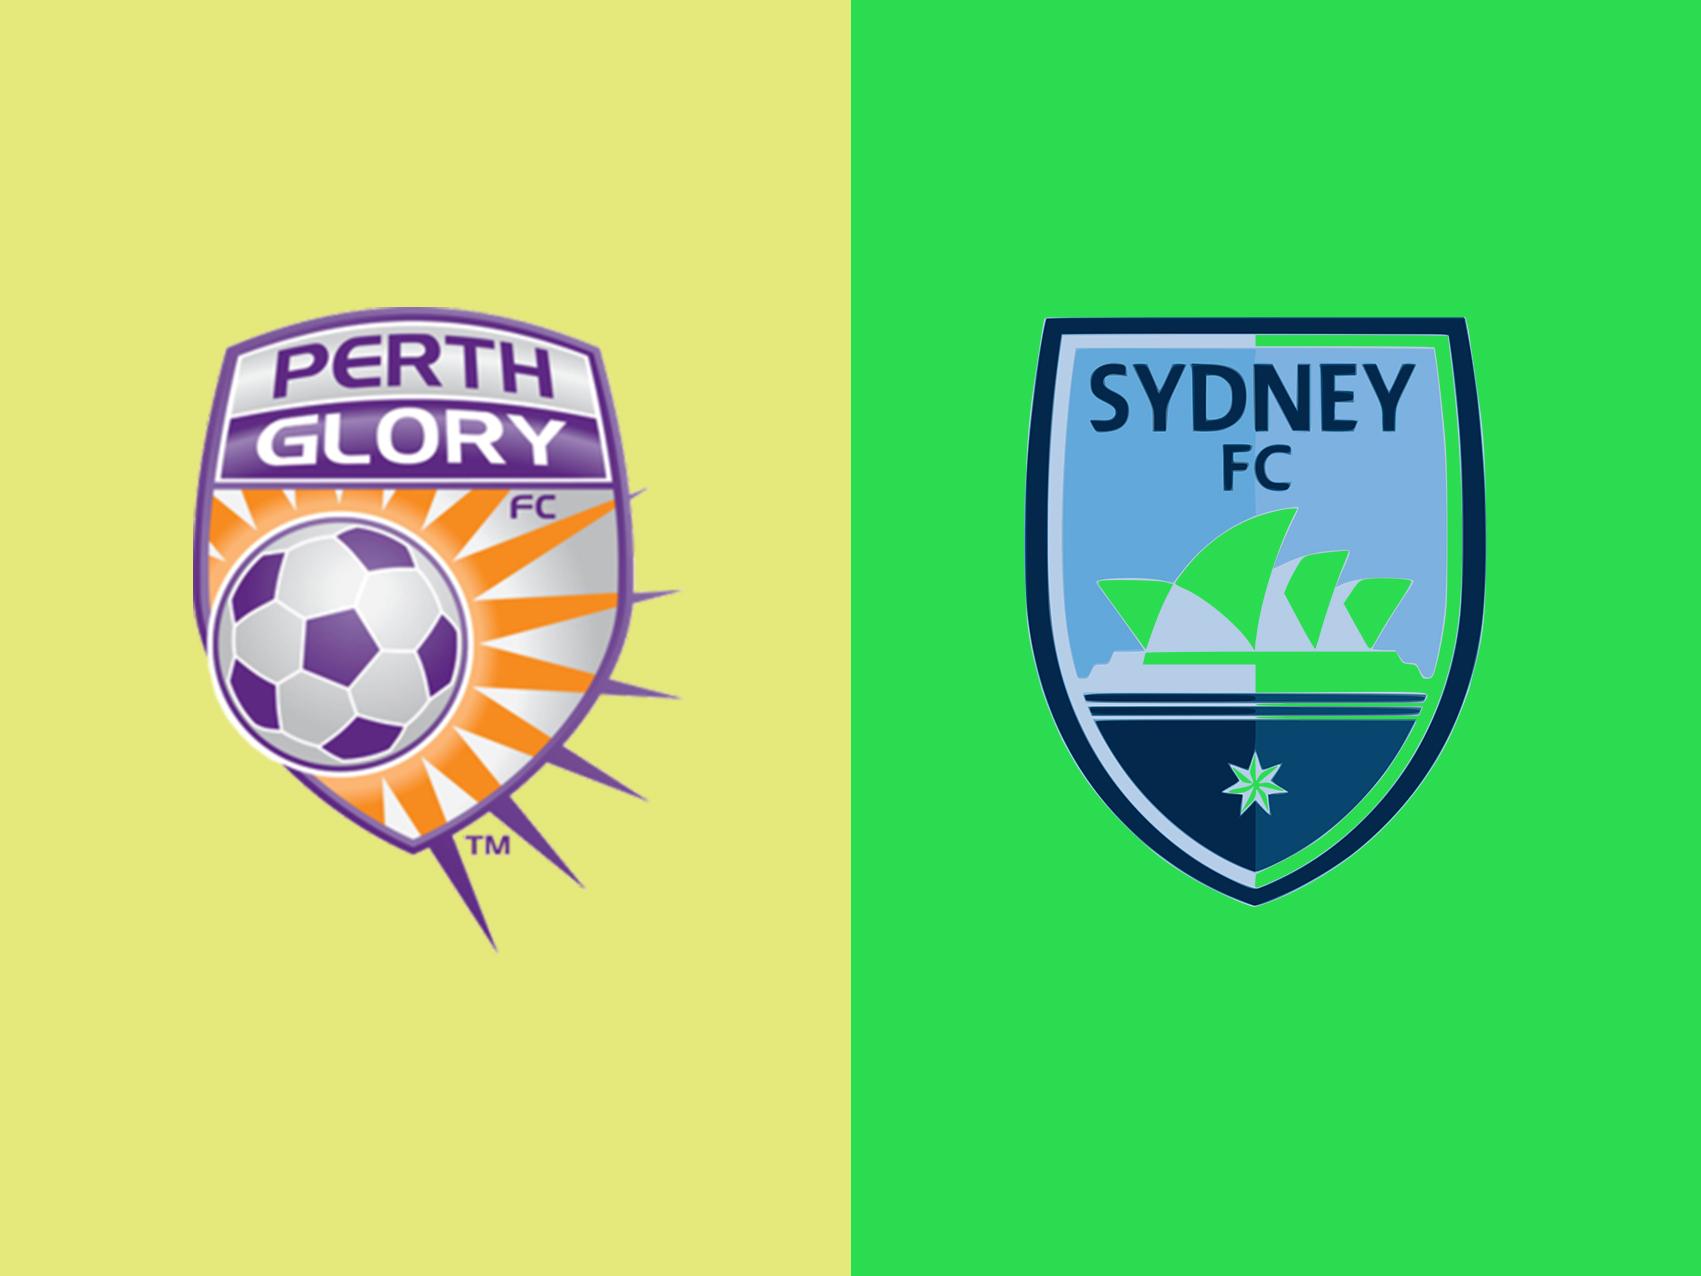 perth-glory-vs-sydney-–-tip-bong-da-9-1-2019 1